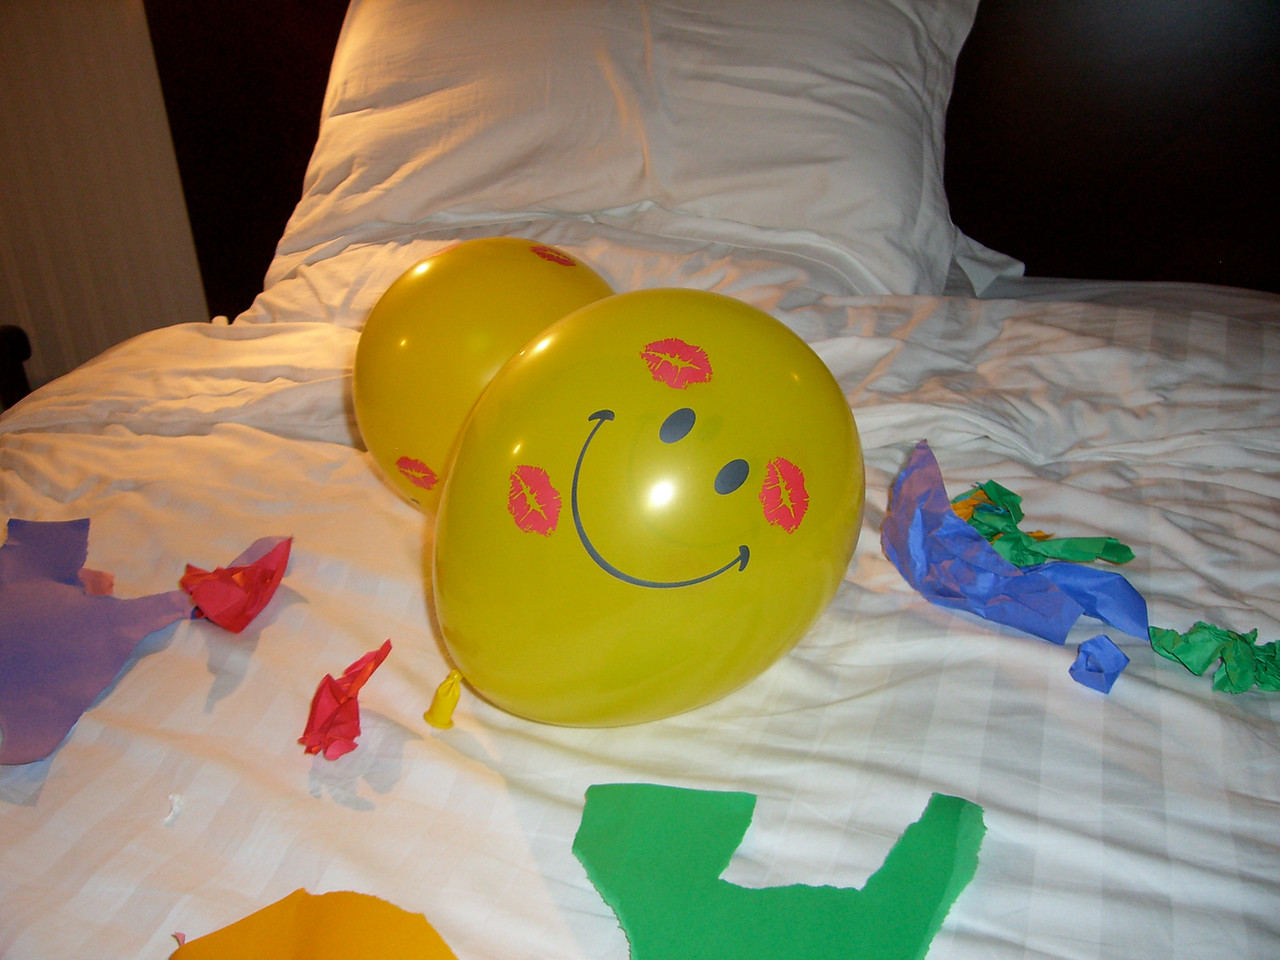 2006 07 15 Sat - Alice Tung's surprise b-day ballons jpg